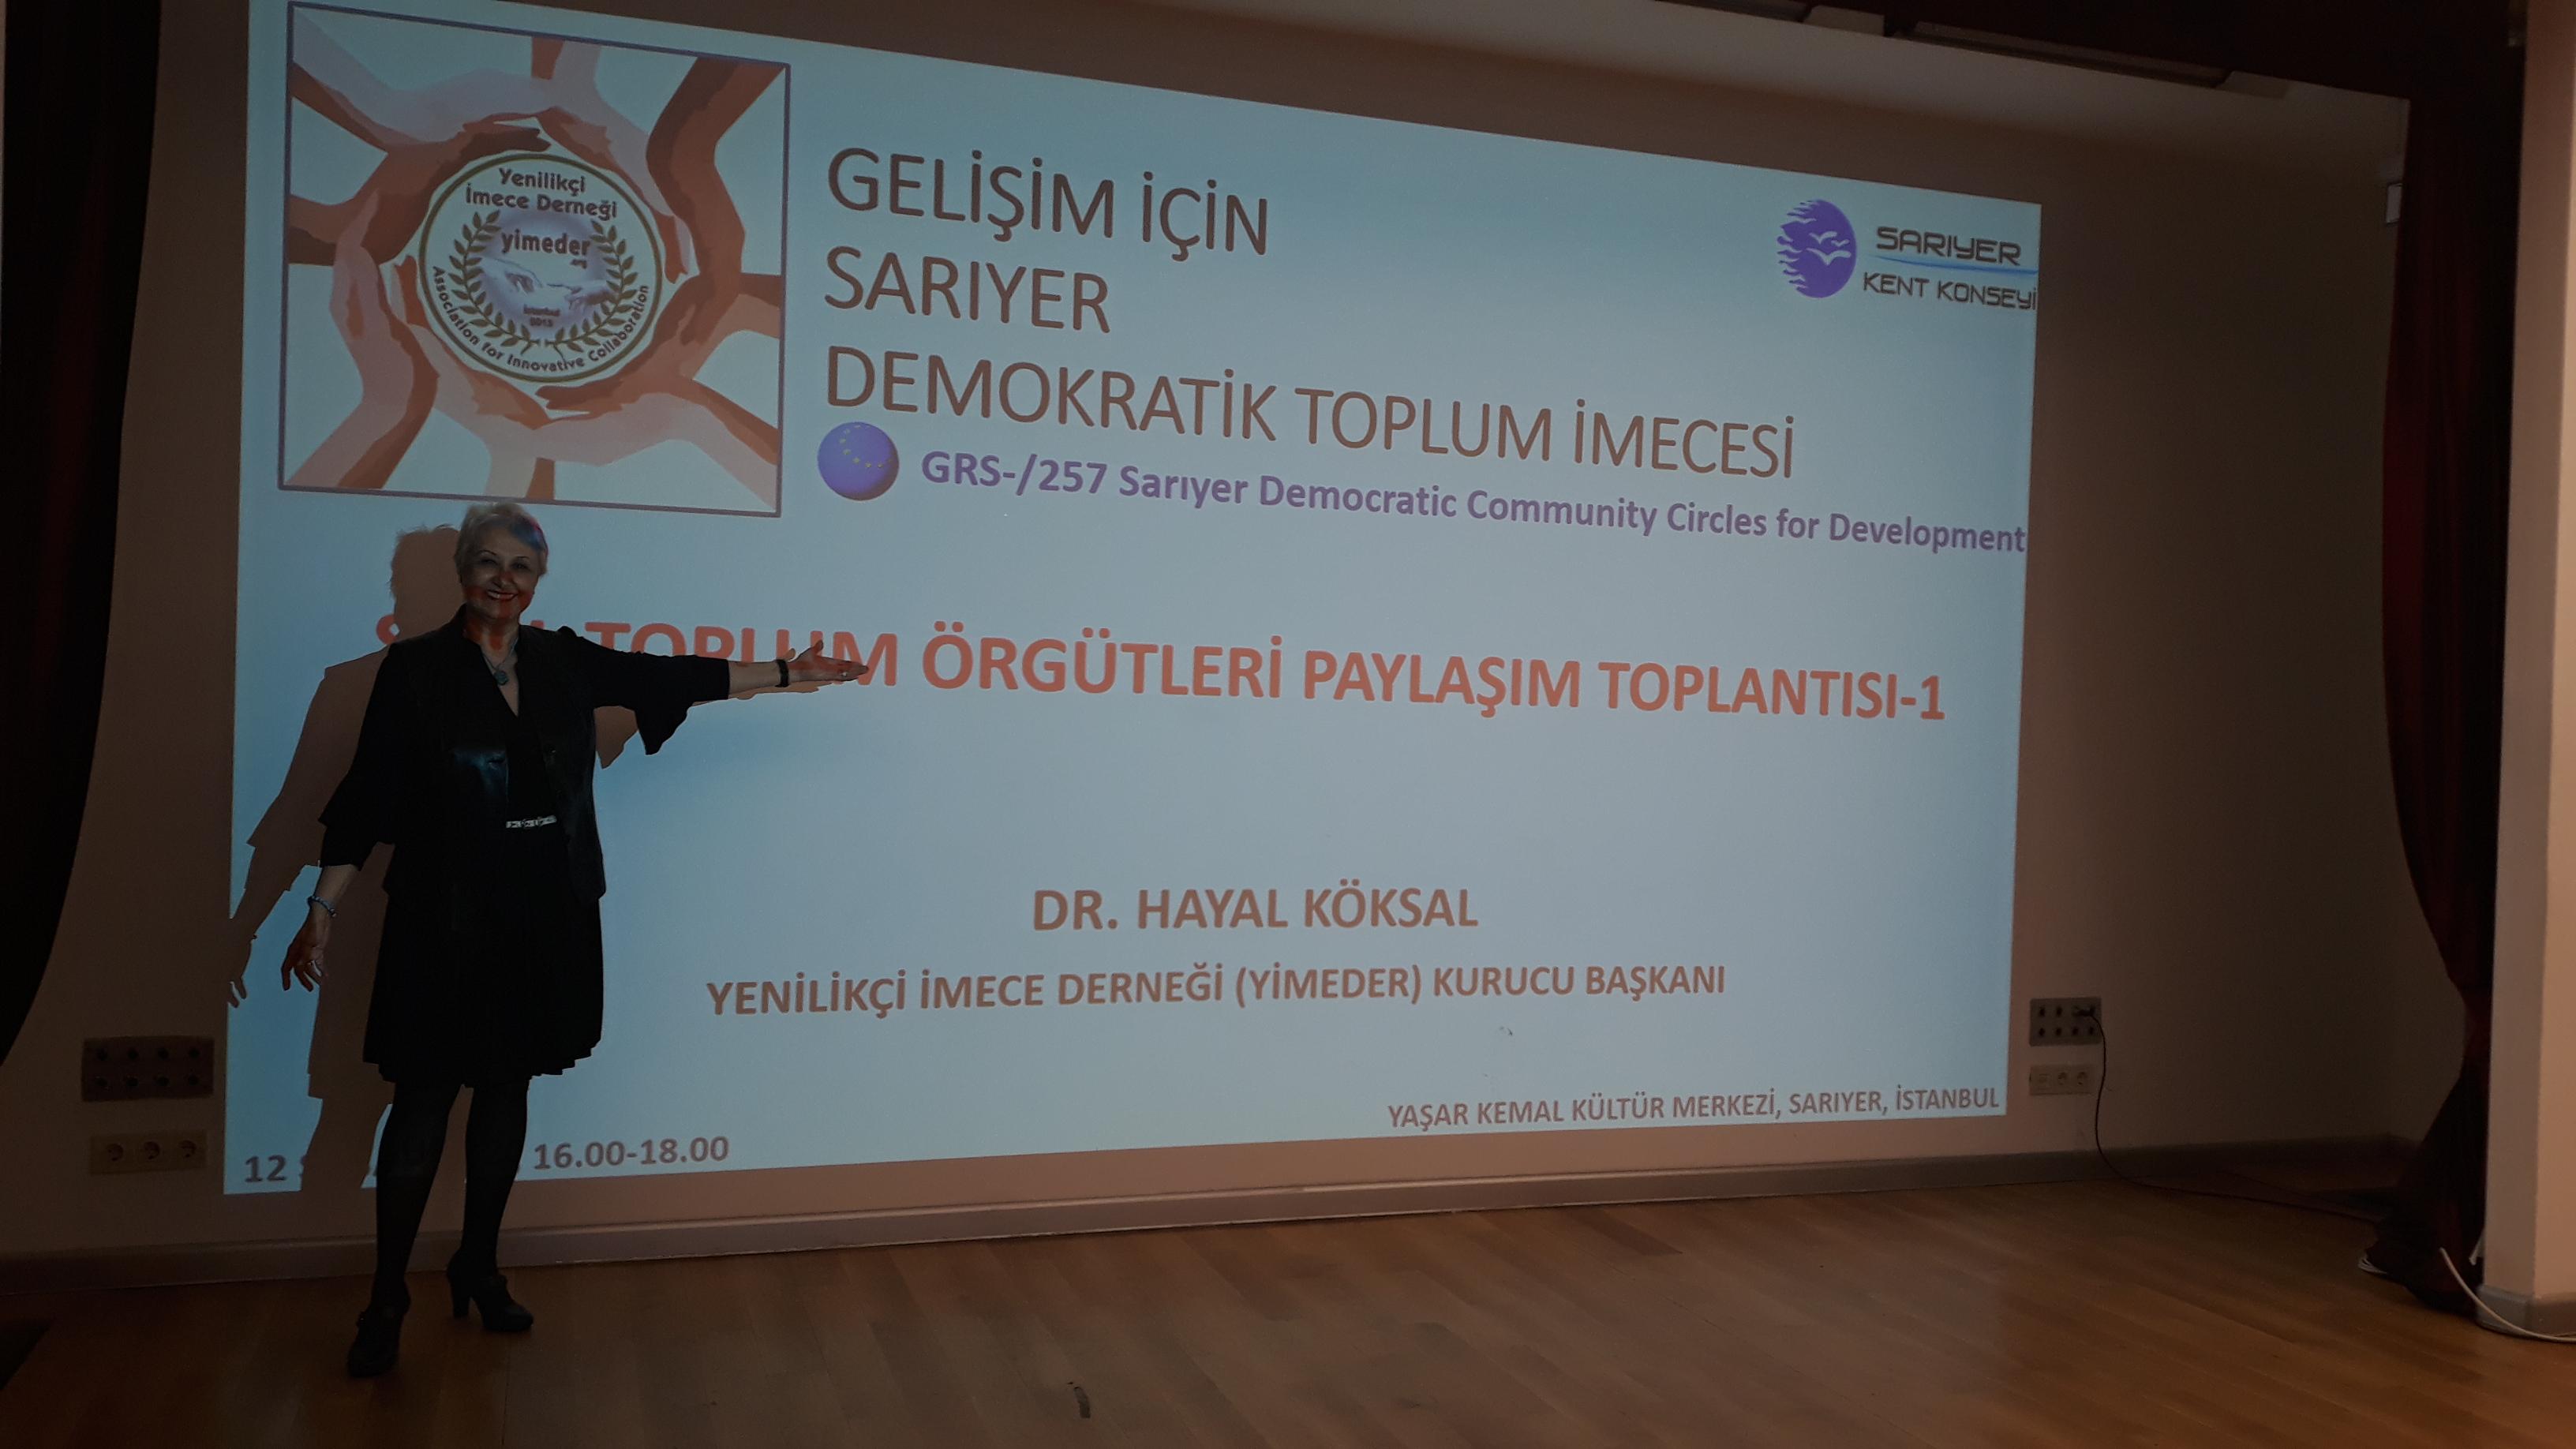 YİMEDER Meeting with Sarıyer NGOs – Hayal Köksal's Personal